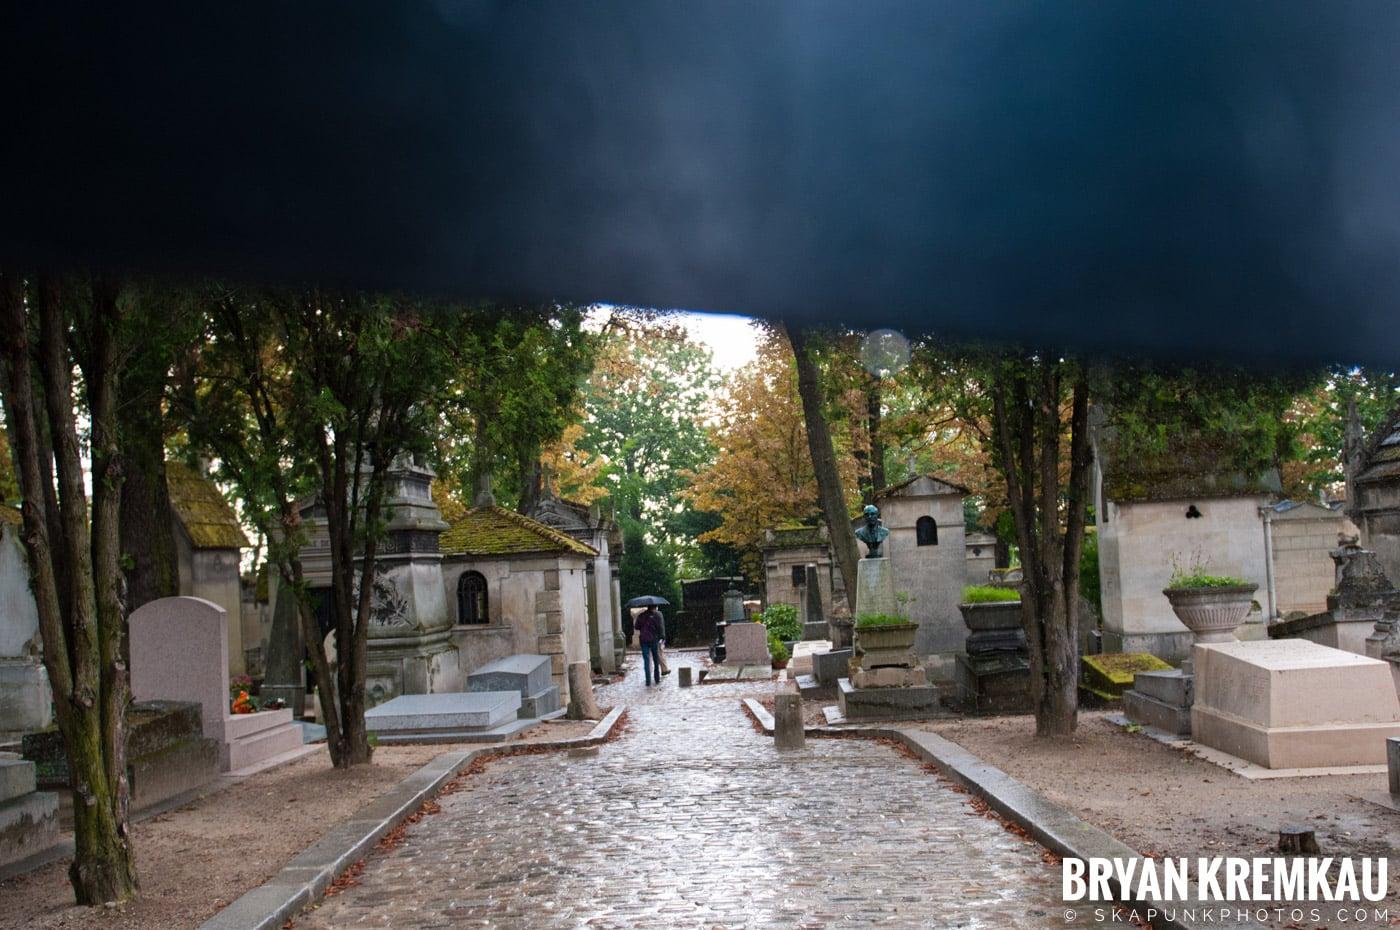 Paris, France Honeymoon - Day 5 - 7.22.11 (25)